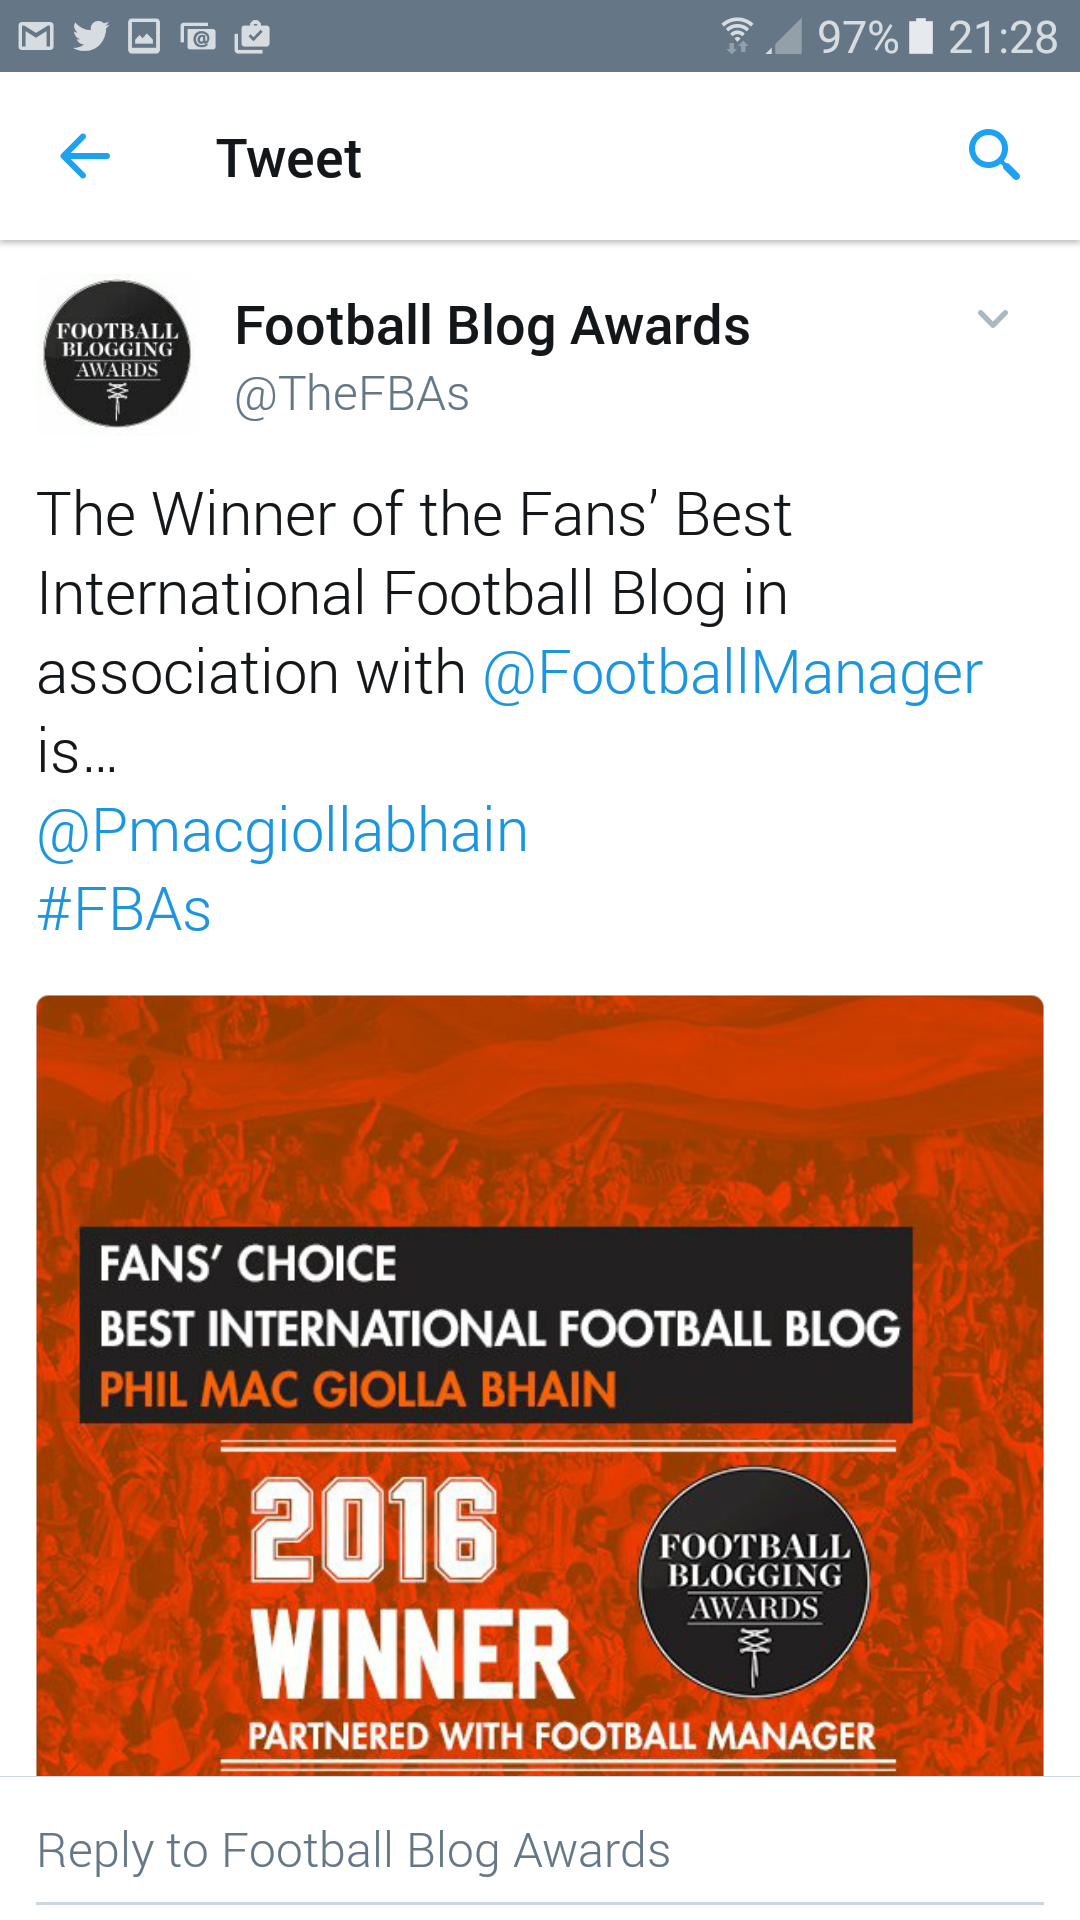 fba-award-winner-tweet